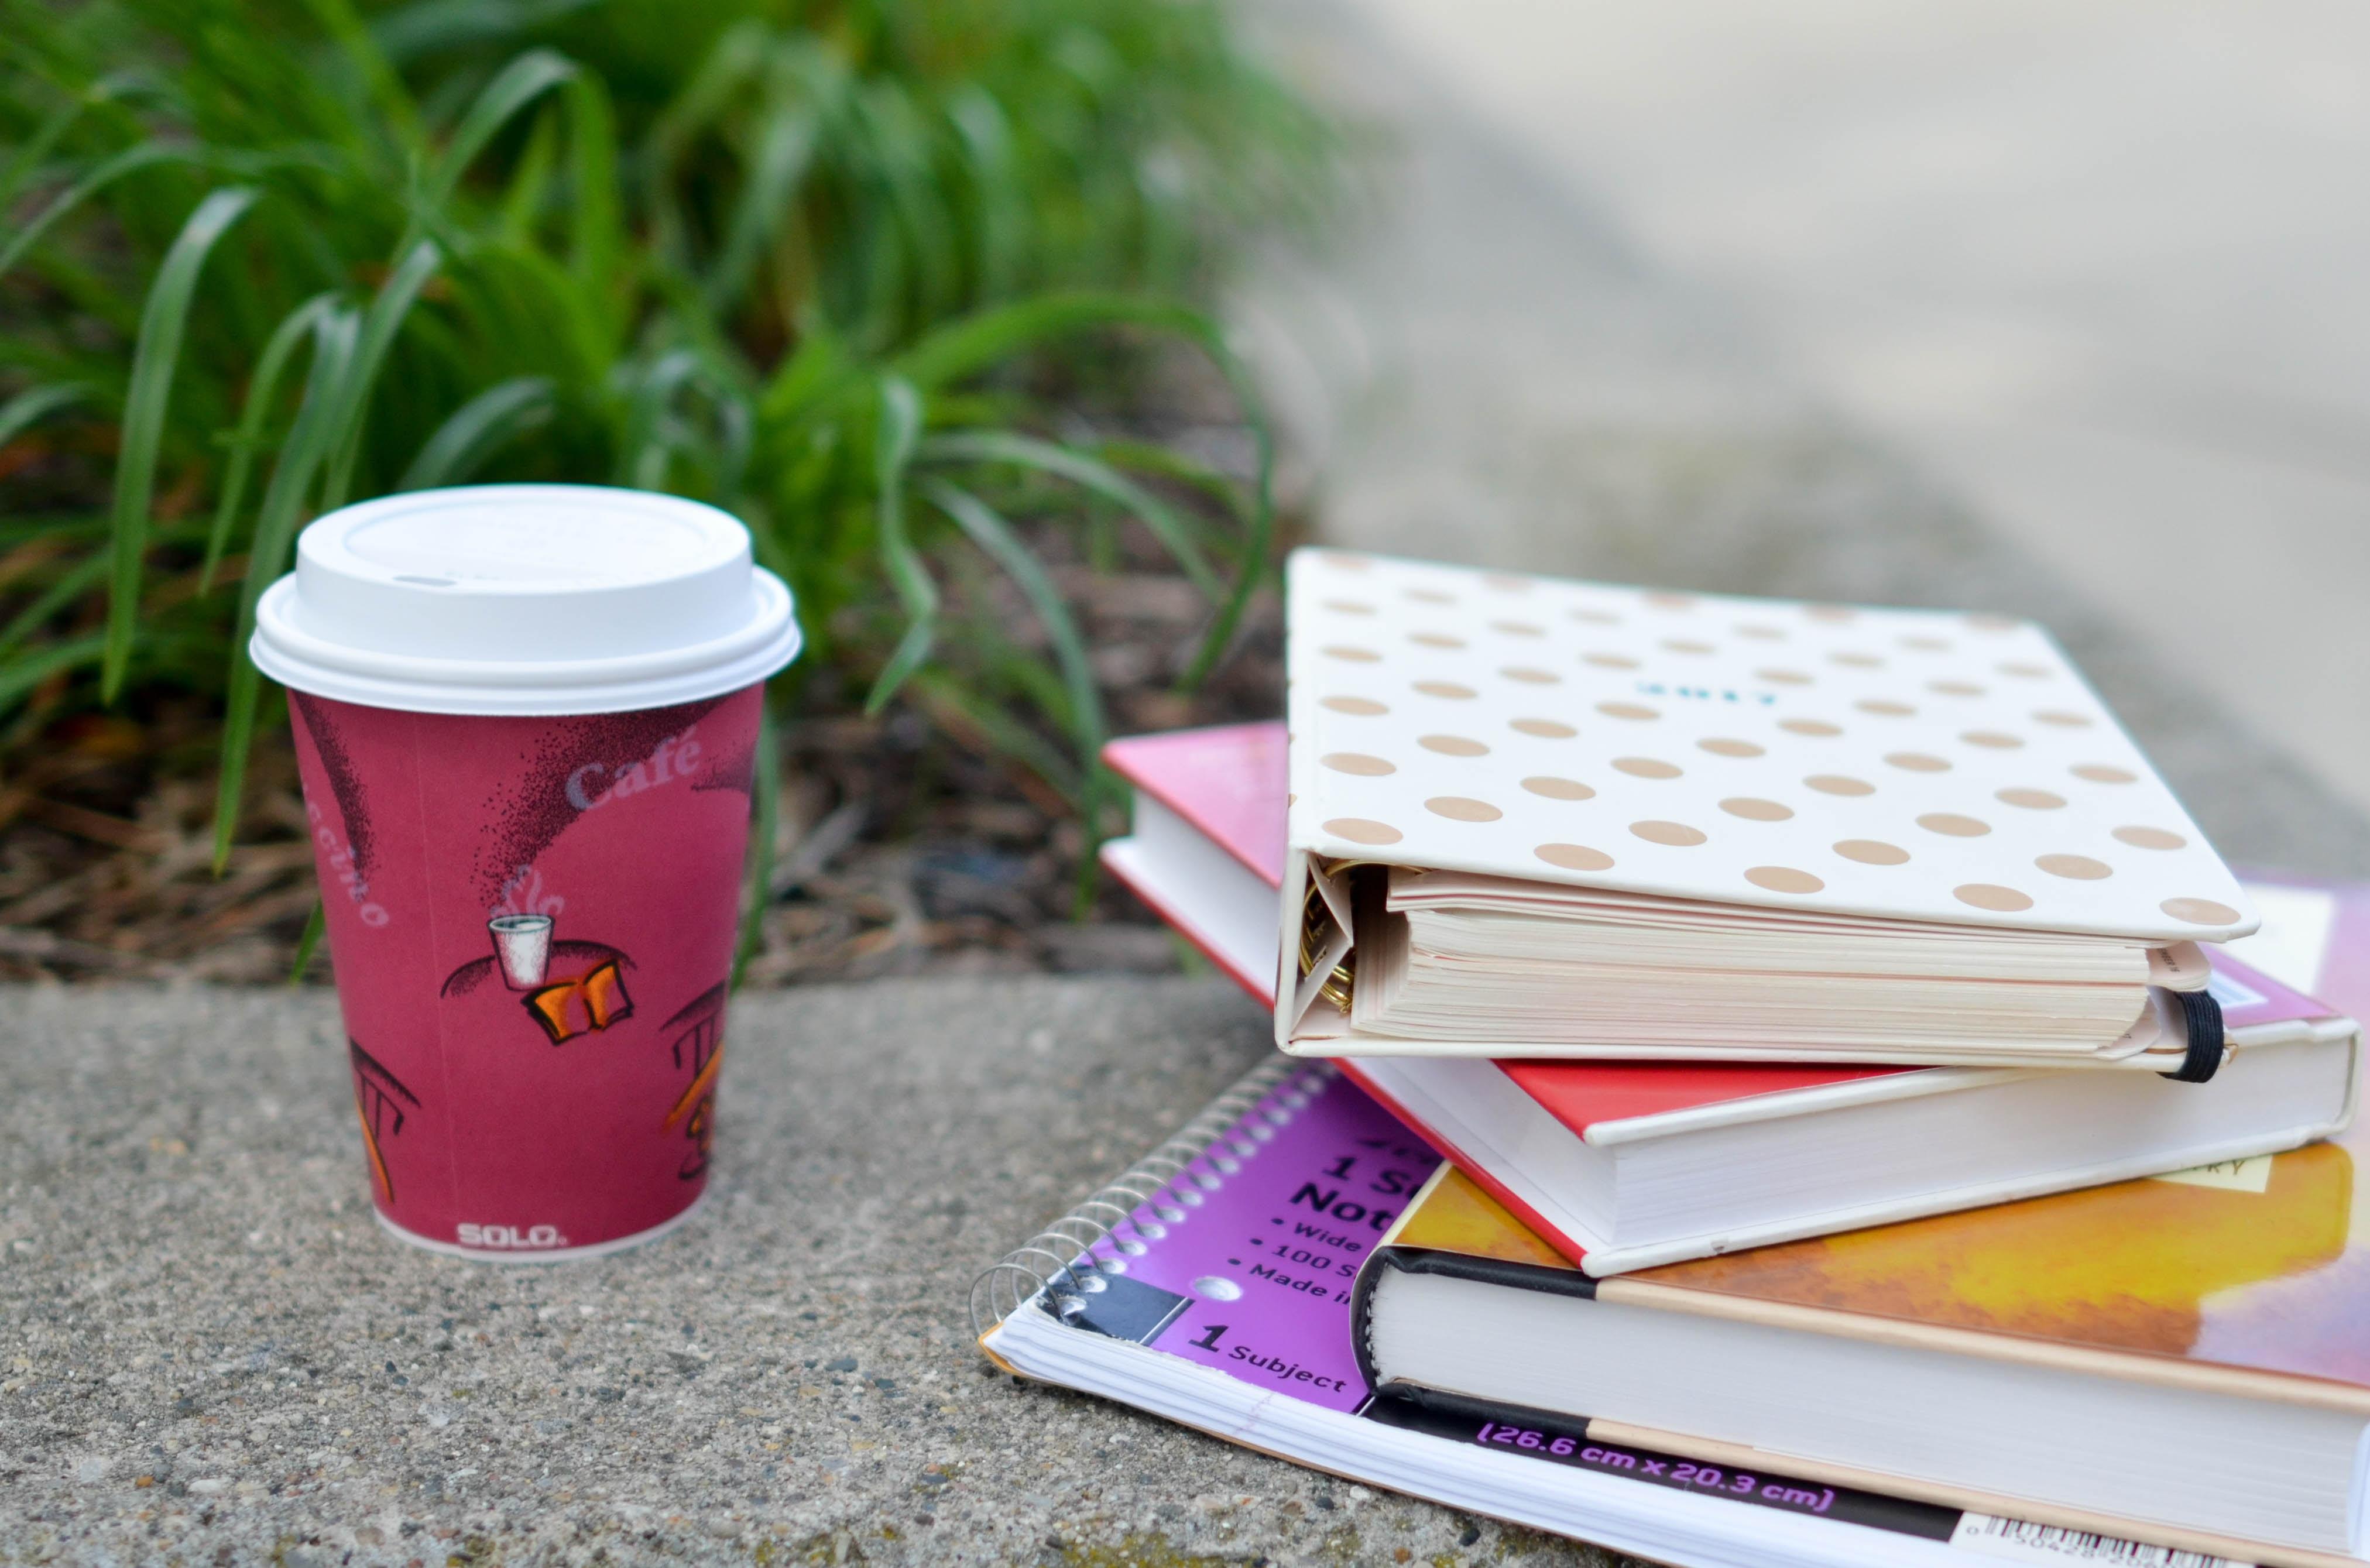 Books and coffee cup on a ledge near a plant Royal Oak